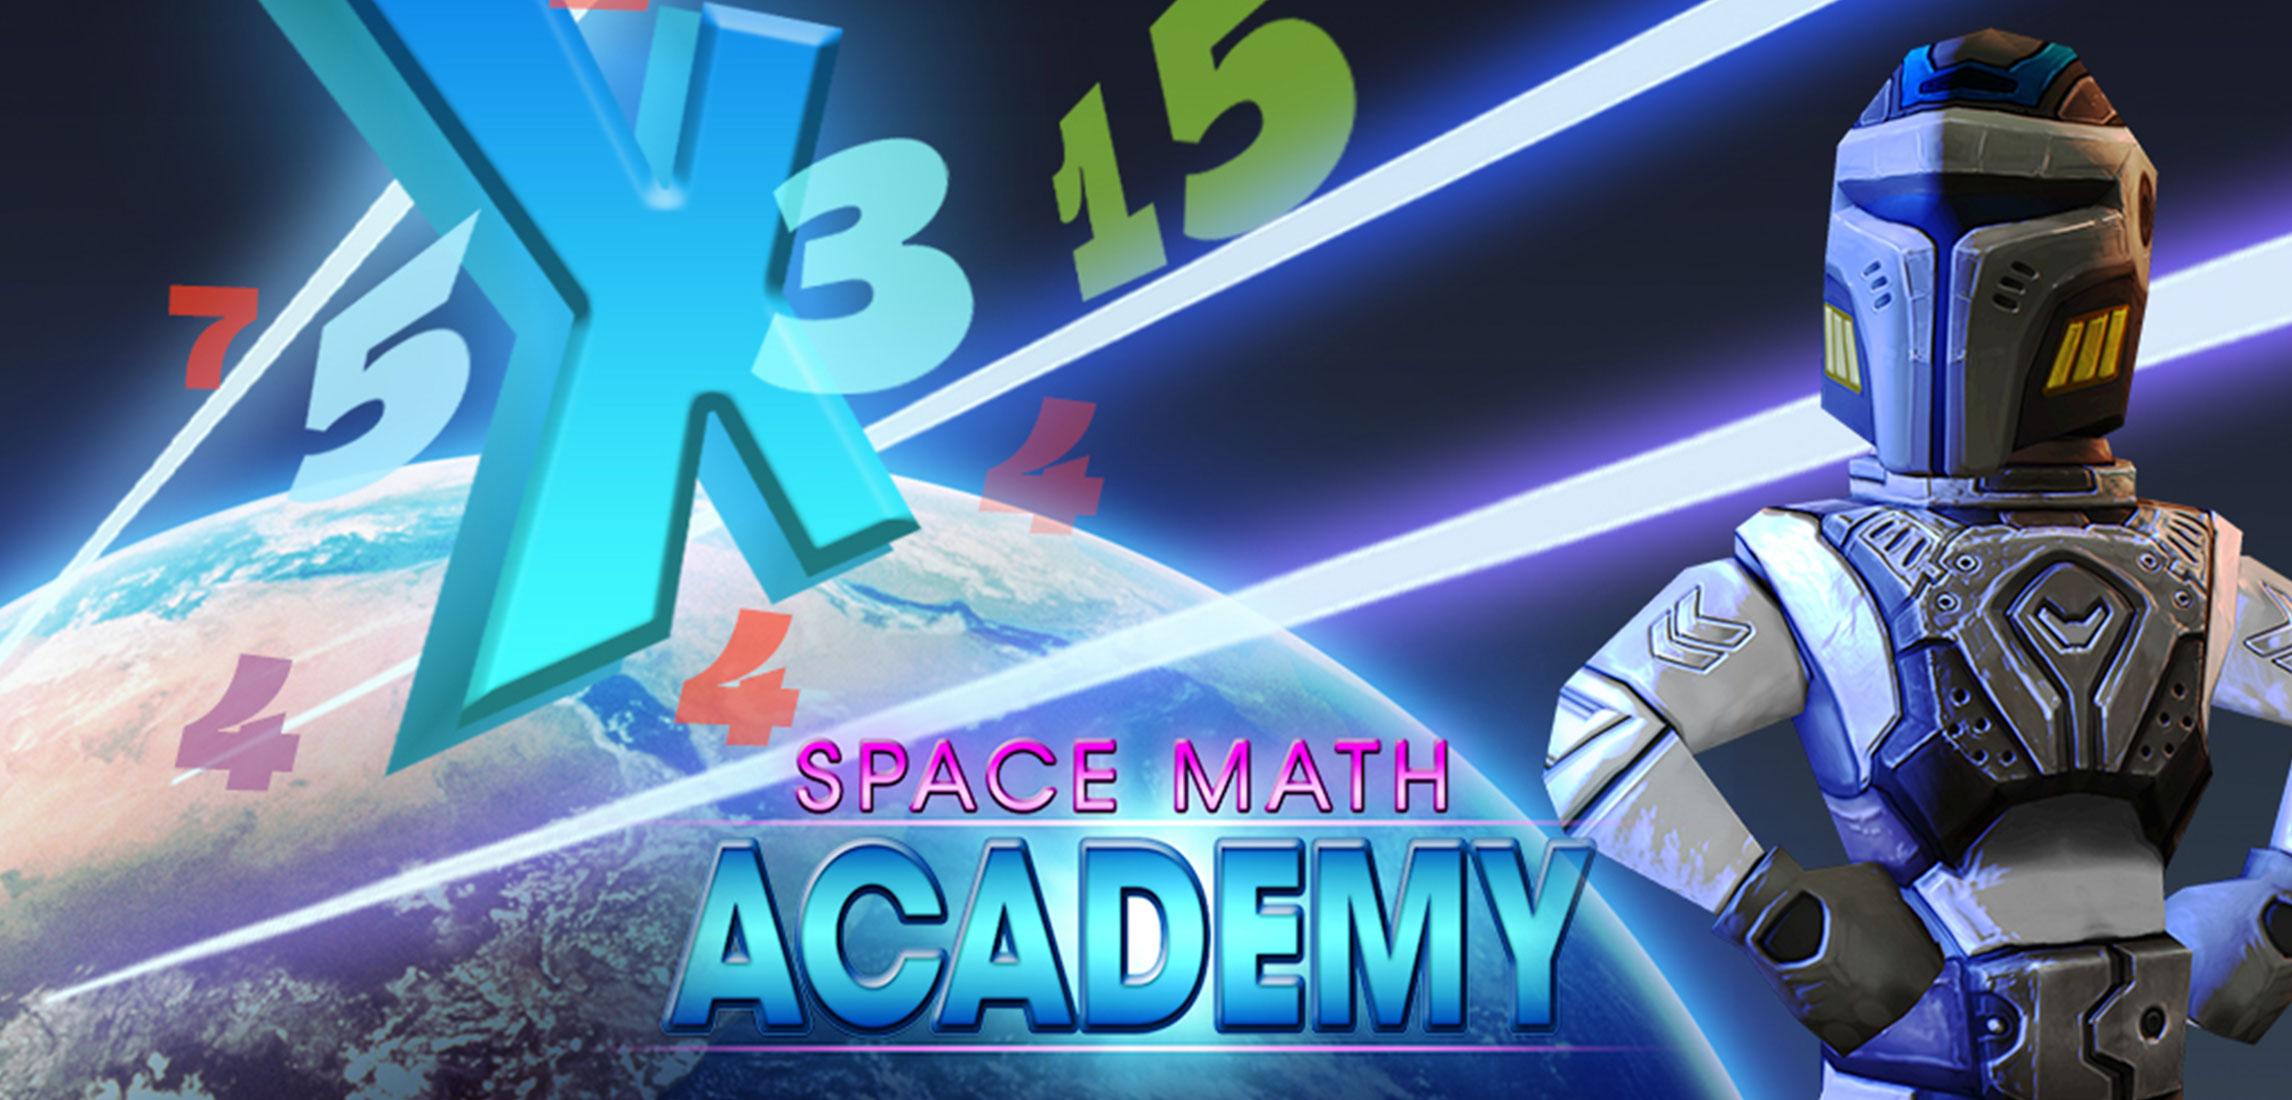 Space Math Academy